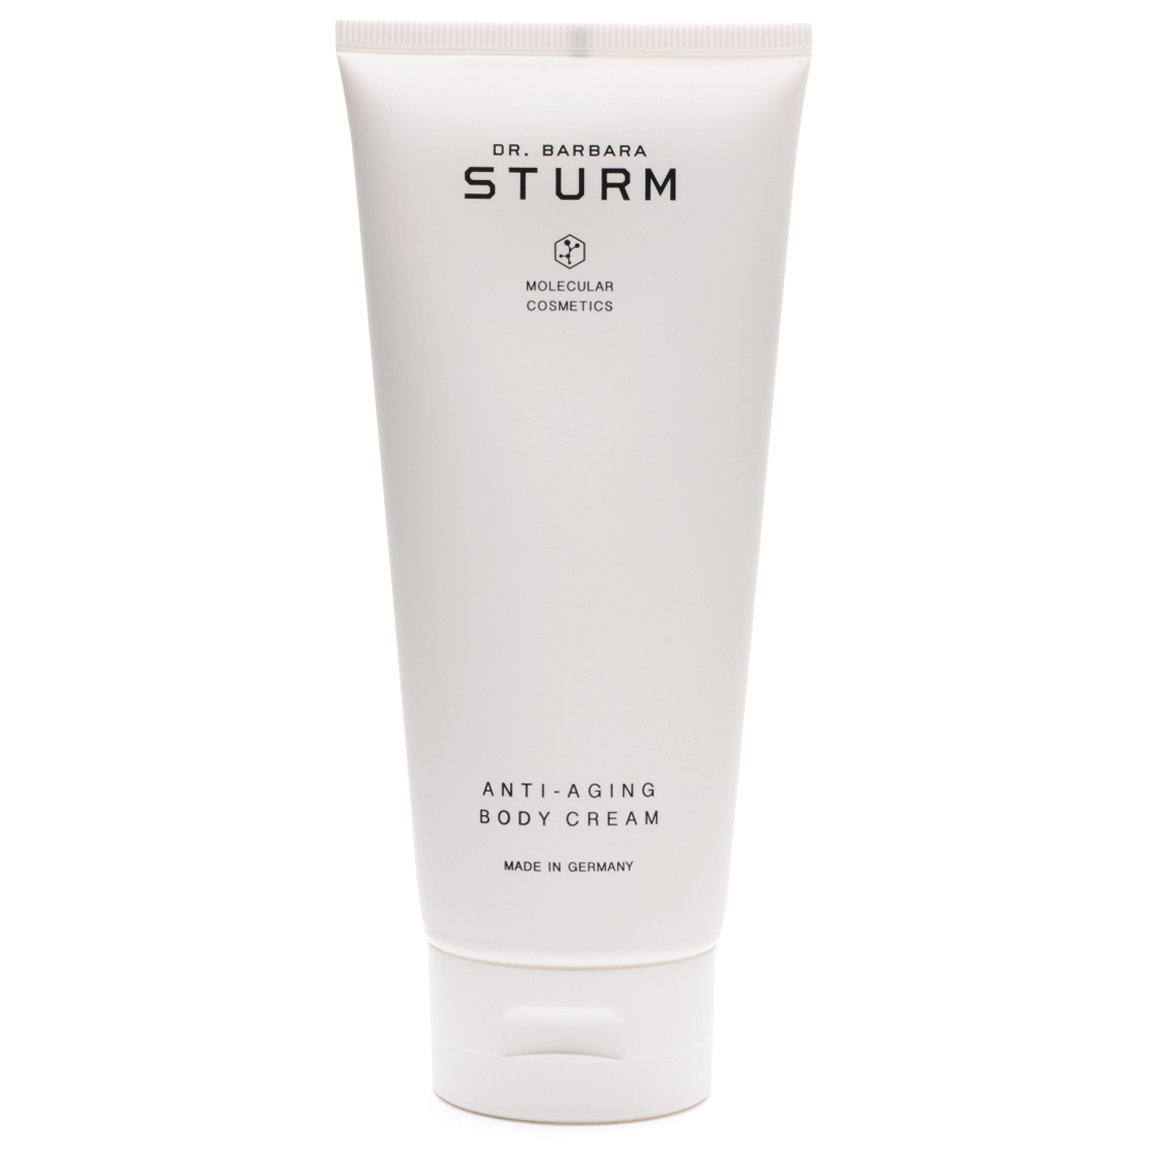 Dr. Barbara Sturm Anti-Aging Body Cream product swatch.